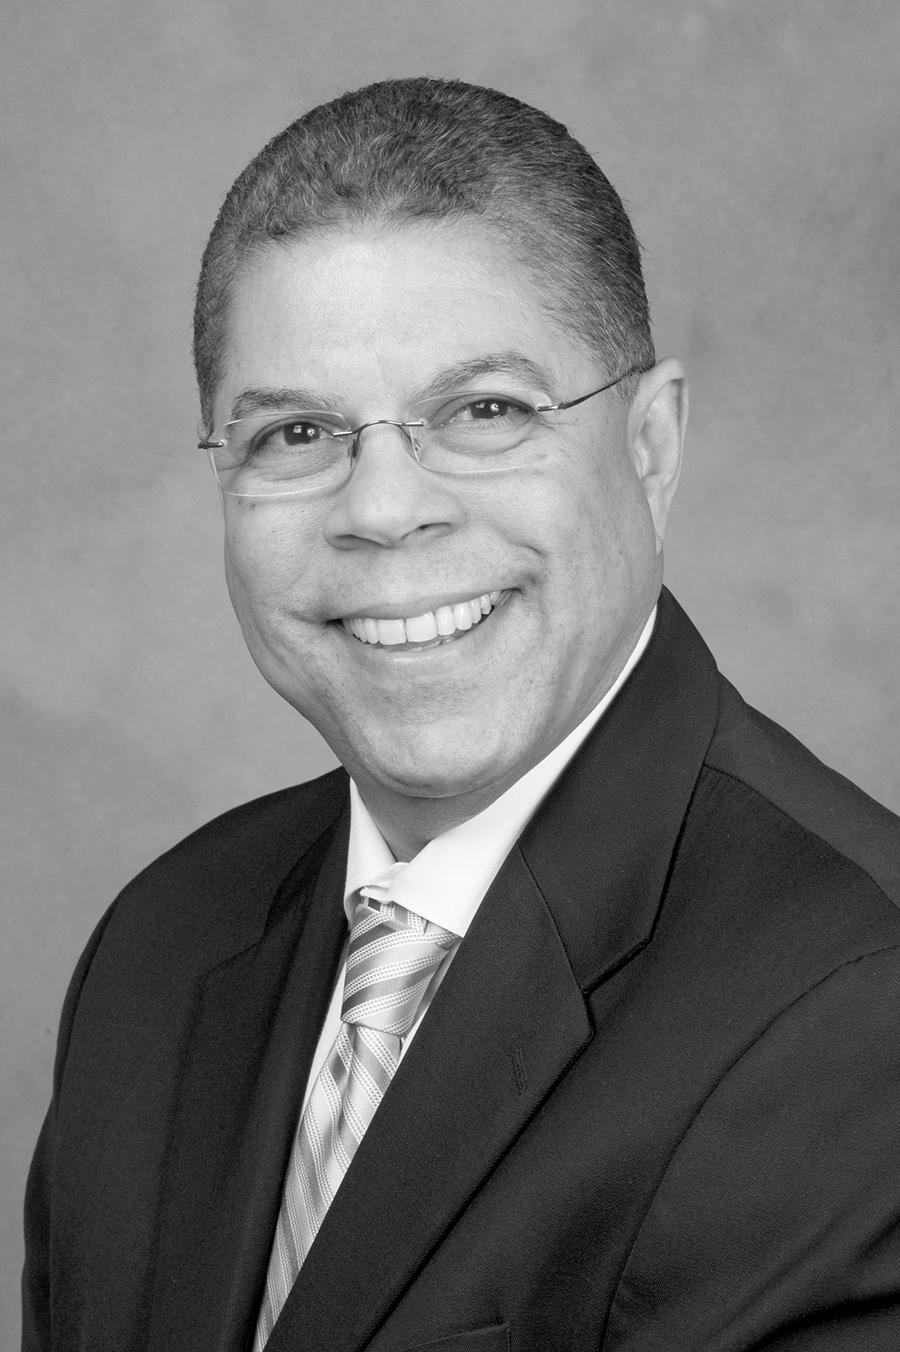 Ald. Roberto Maldonado is the new chair of the Chicago City Council Latino Caucus